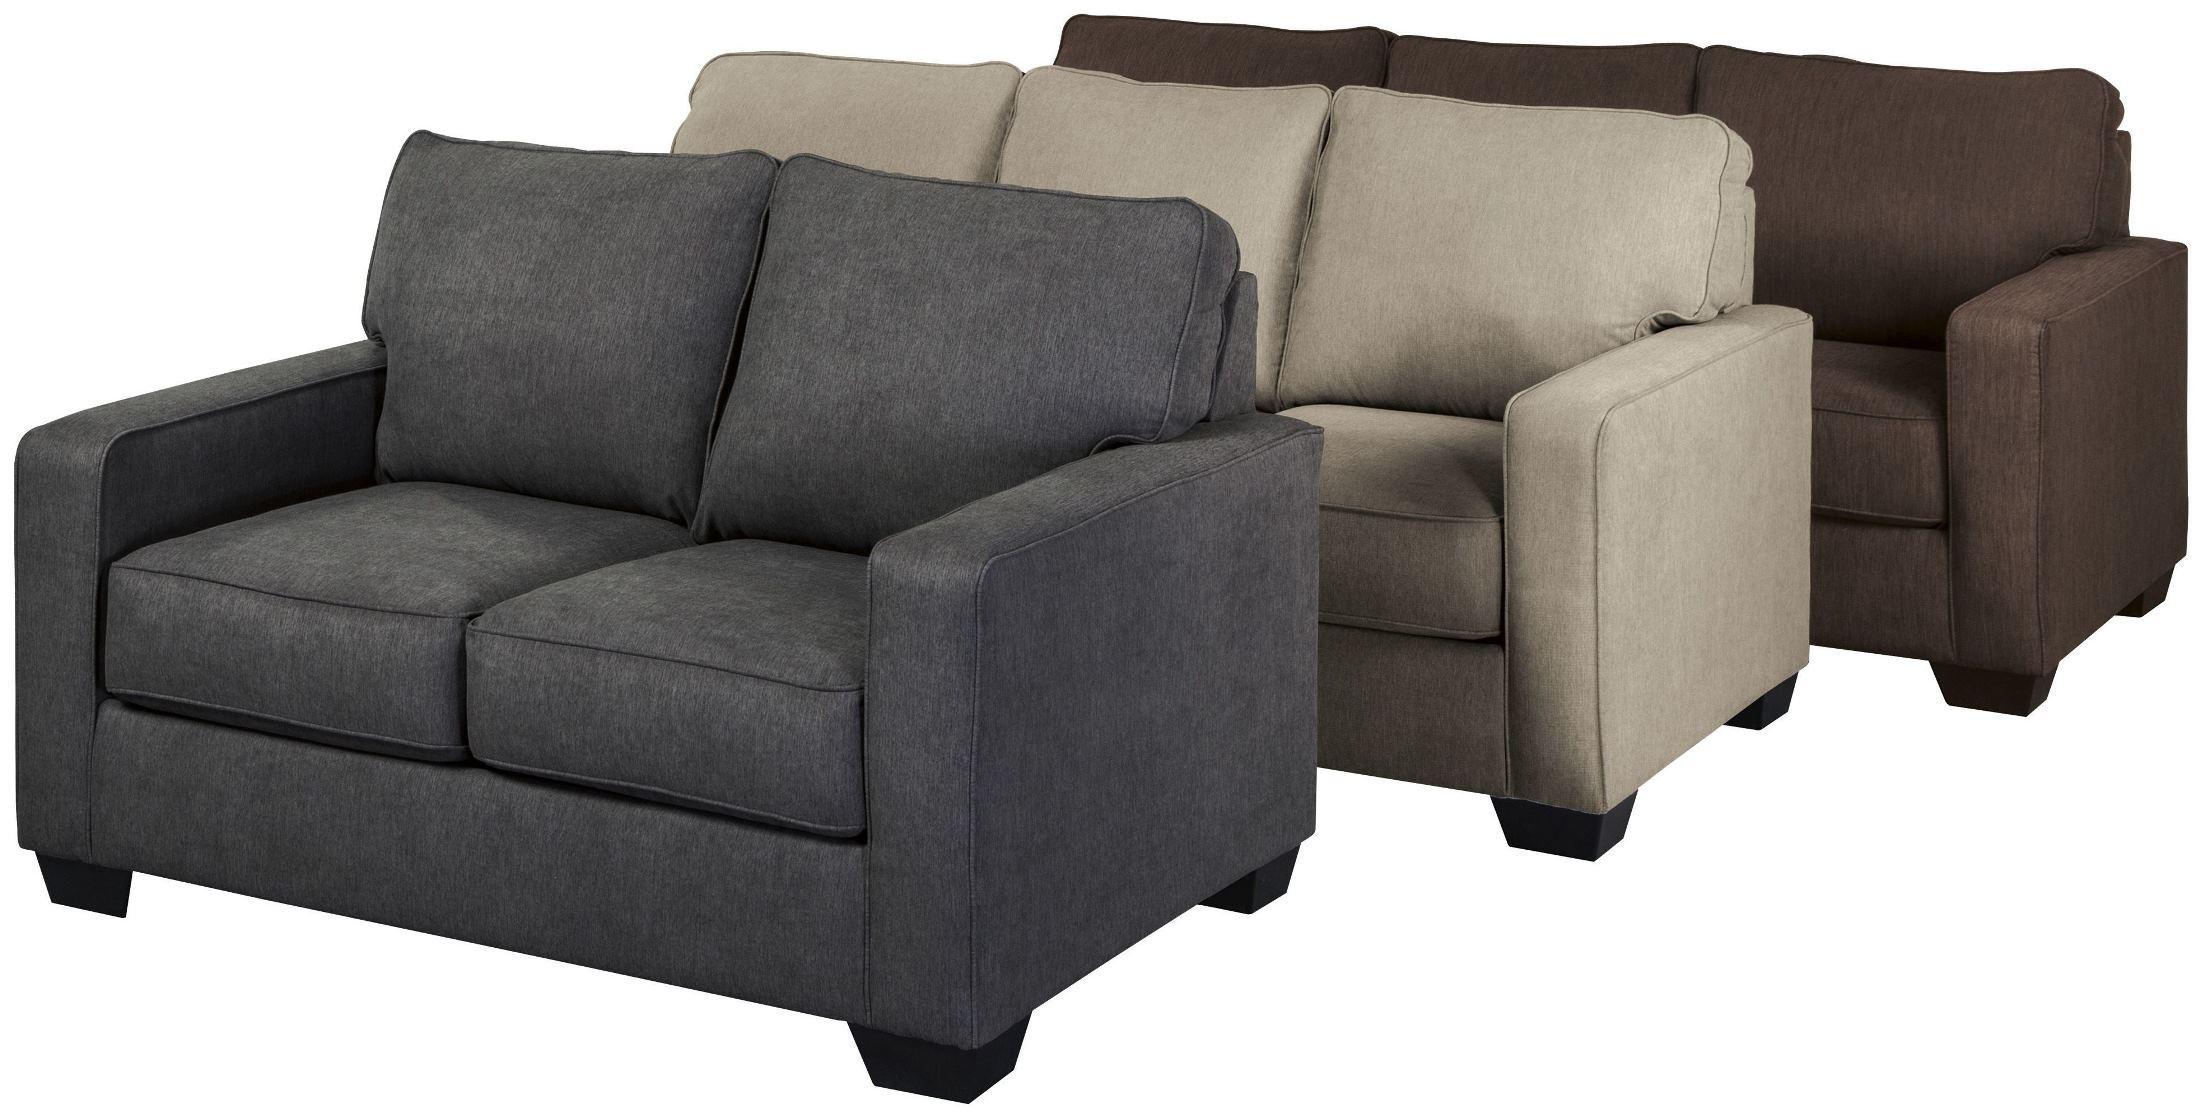 Zeb Charcoal Full Sofa Sleeper From Ashley Coleman Furniture